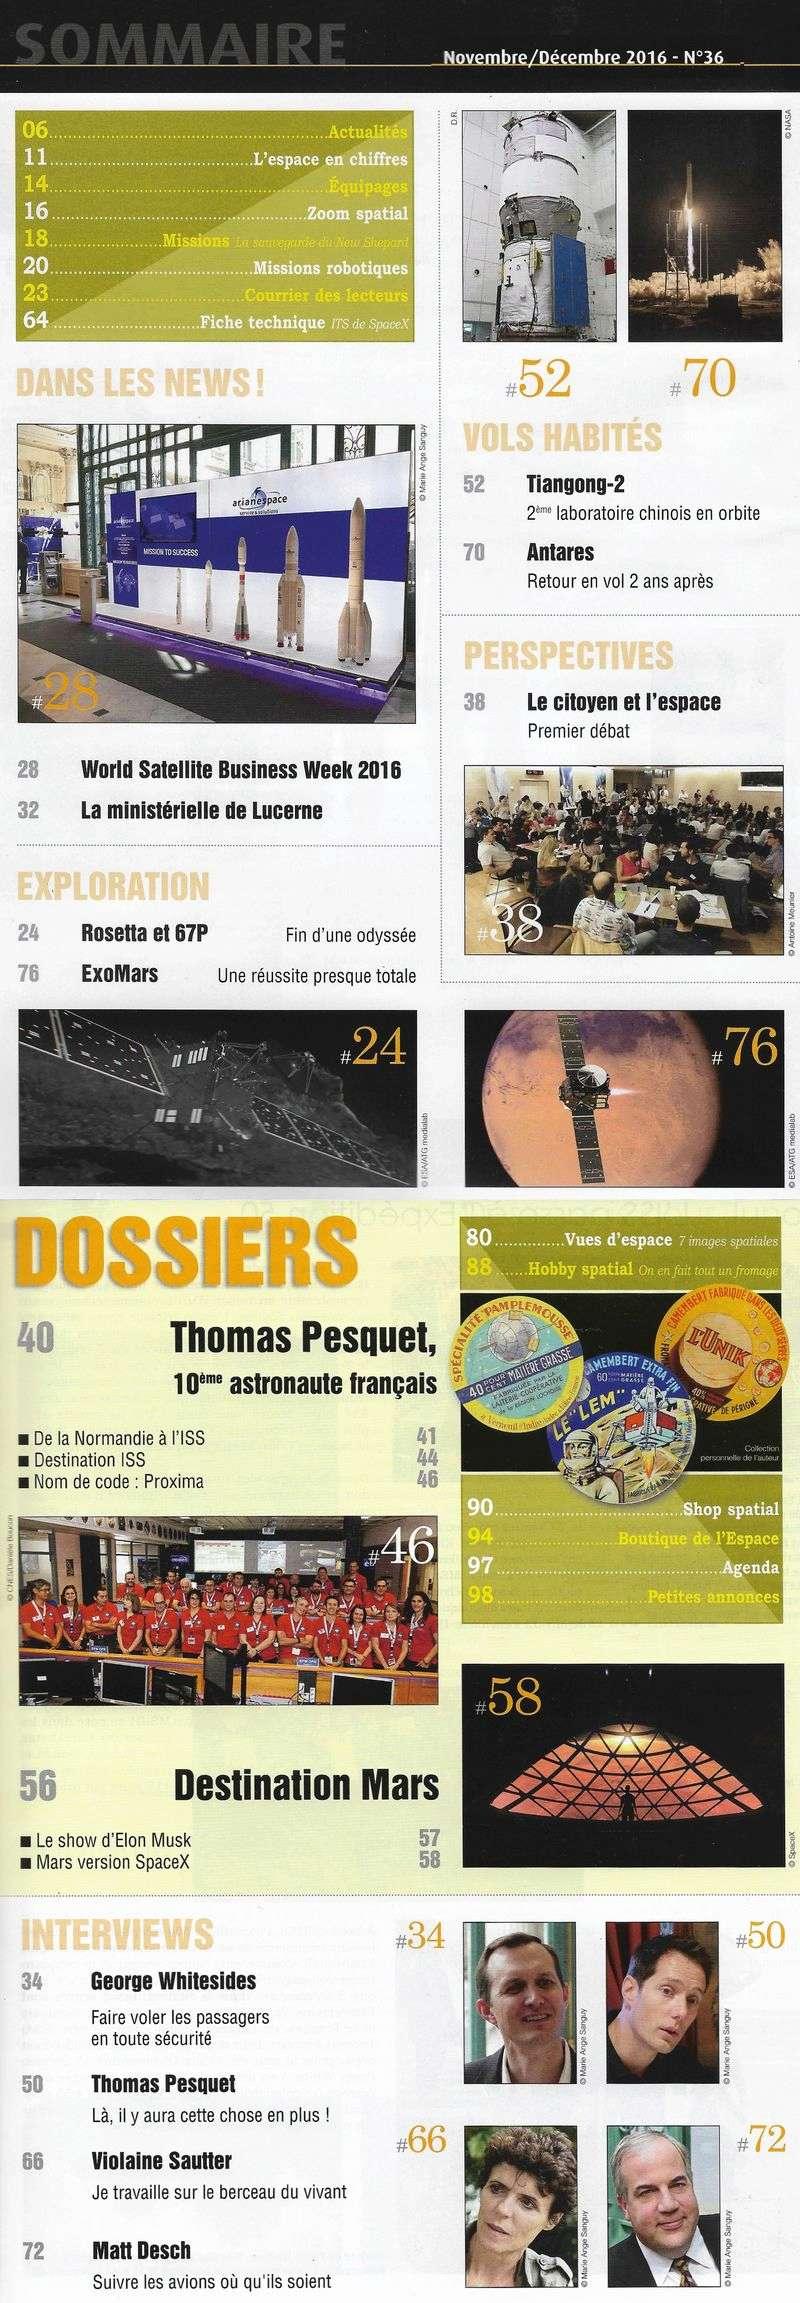 Espace & Exploration n°36: Thomas Pesquet   16110011